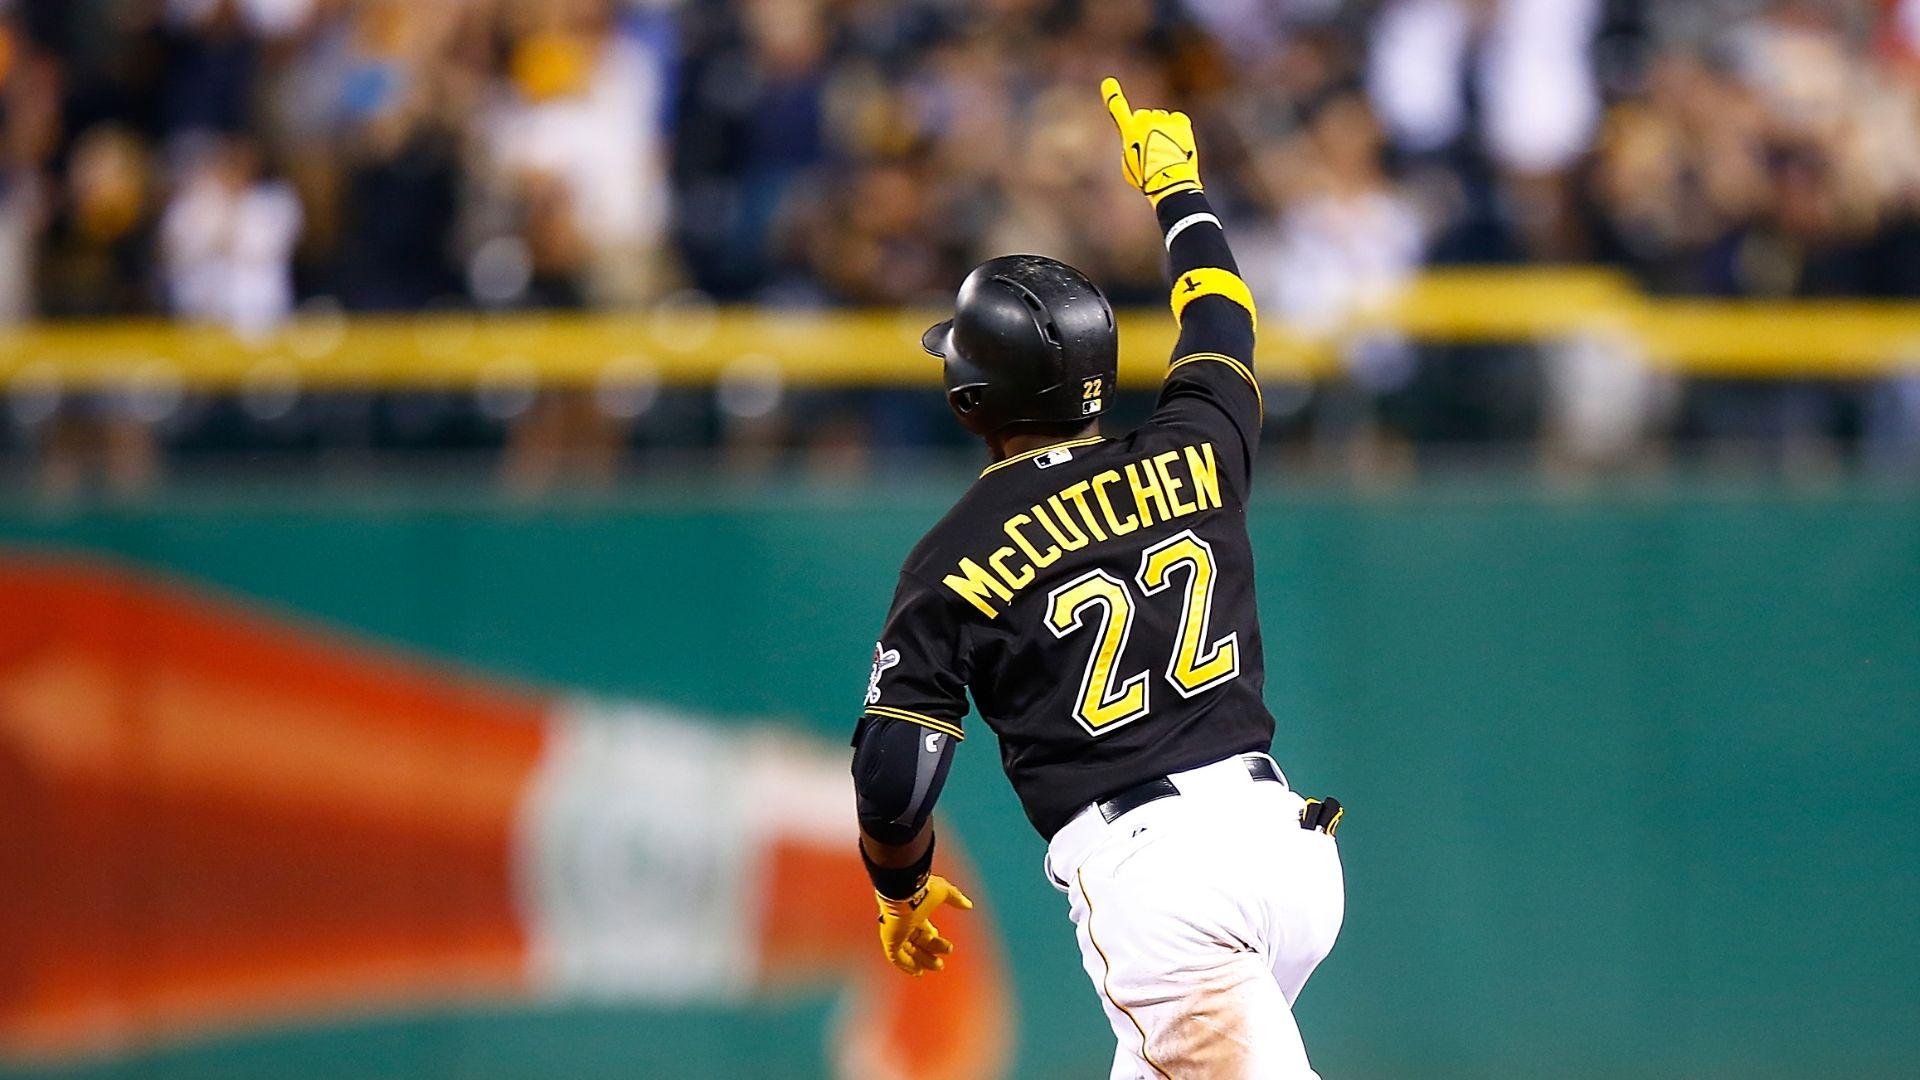 McCutchen was clutch in Pittsburgh